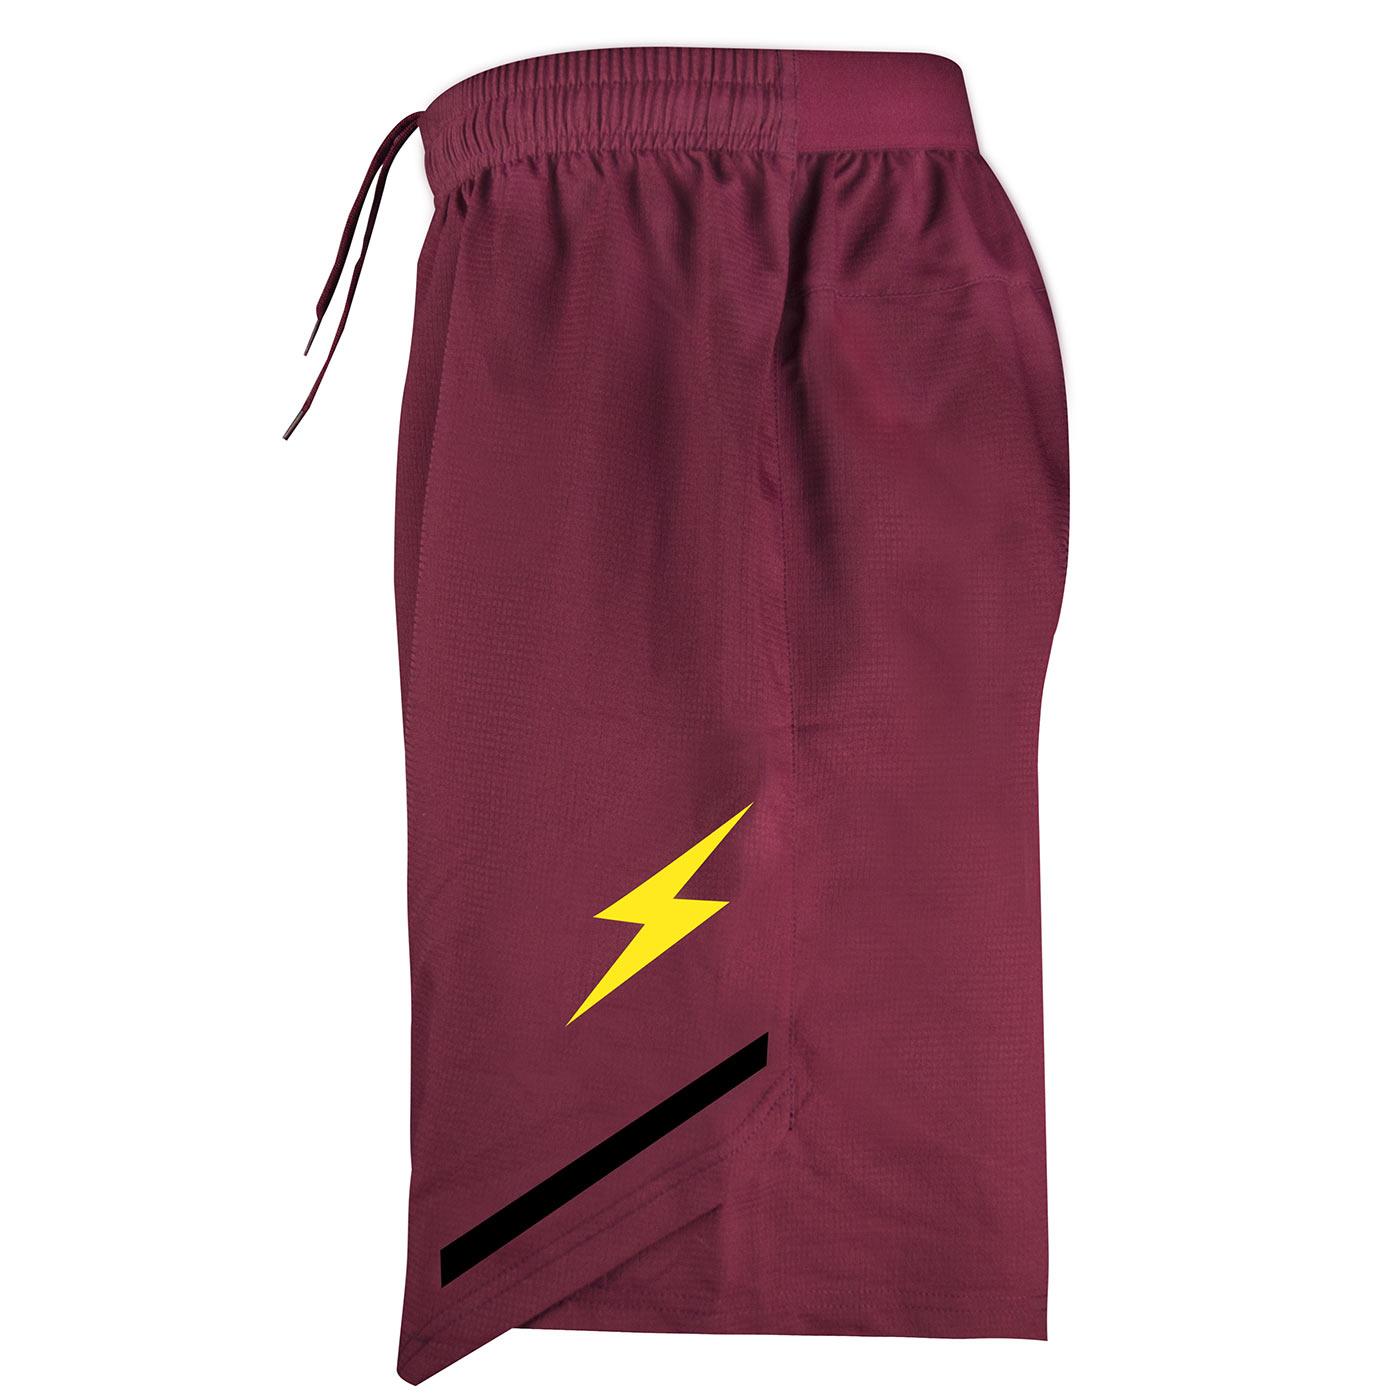 Pantaloncini Salernitana granata Zeus lato